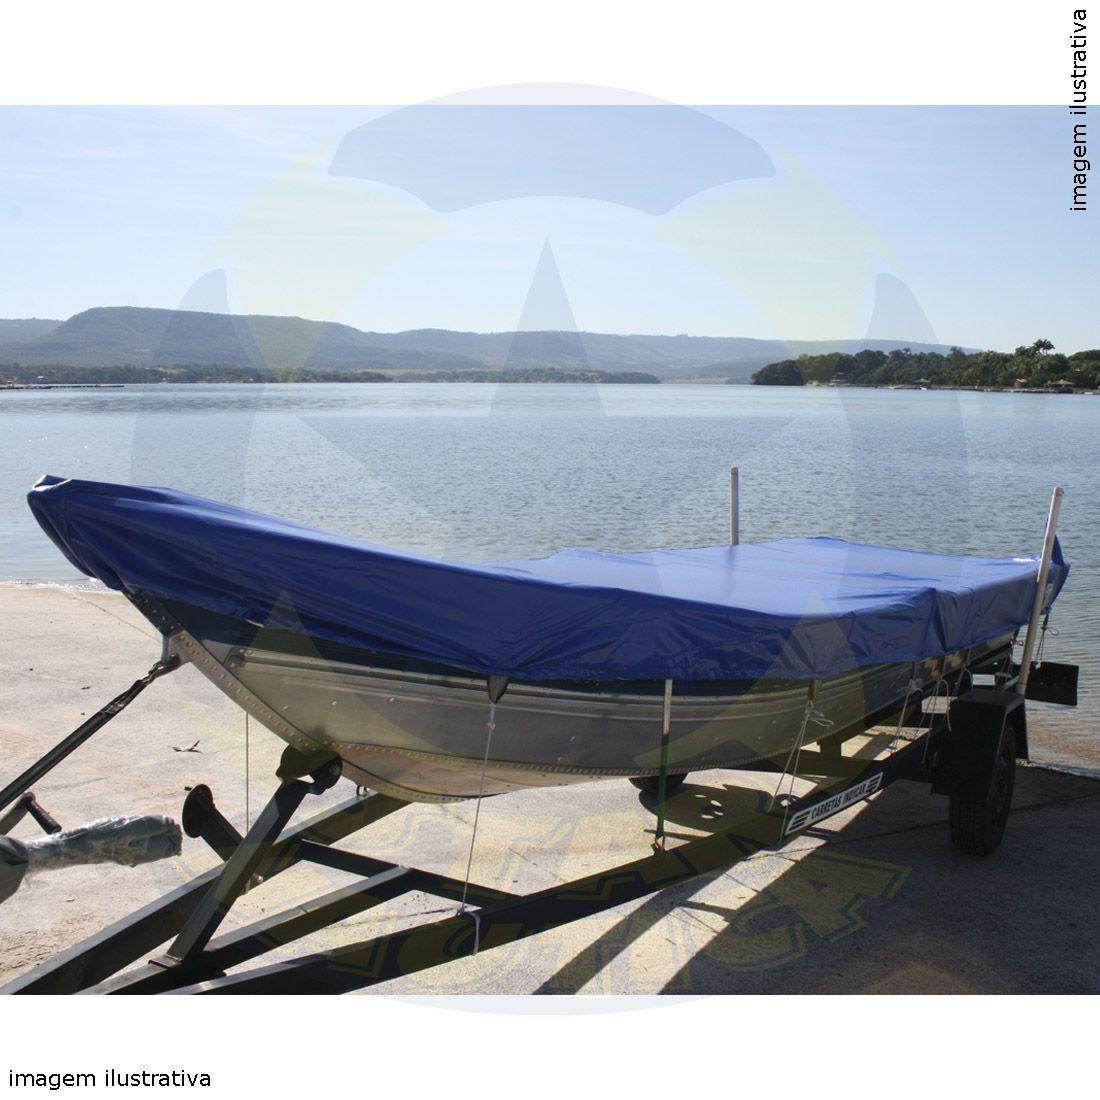 Capa Lona de Cobertura Barco Tupi 600 Lona Vinílica